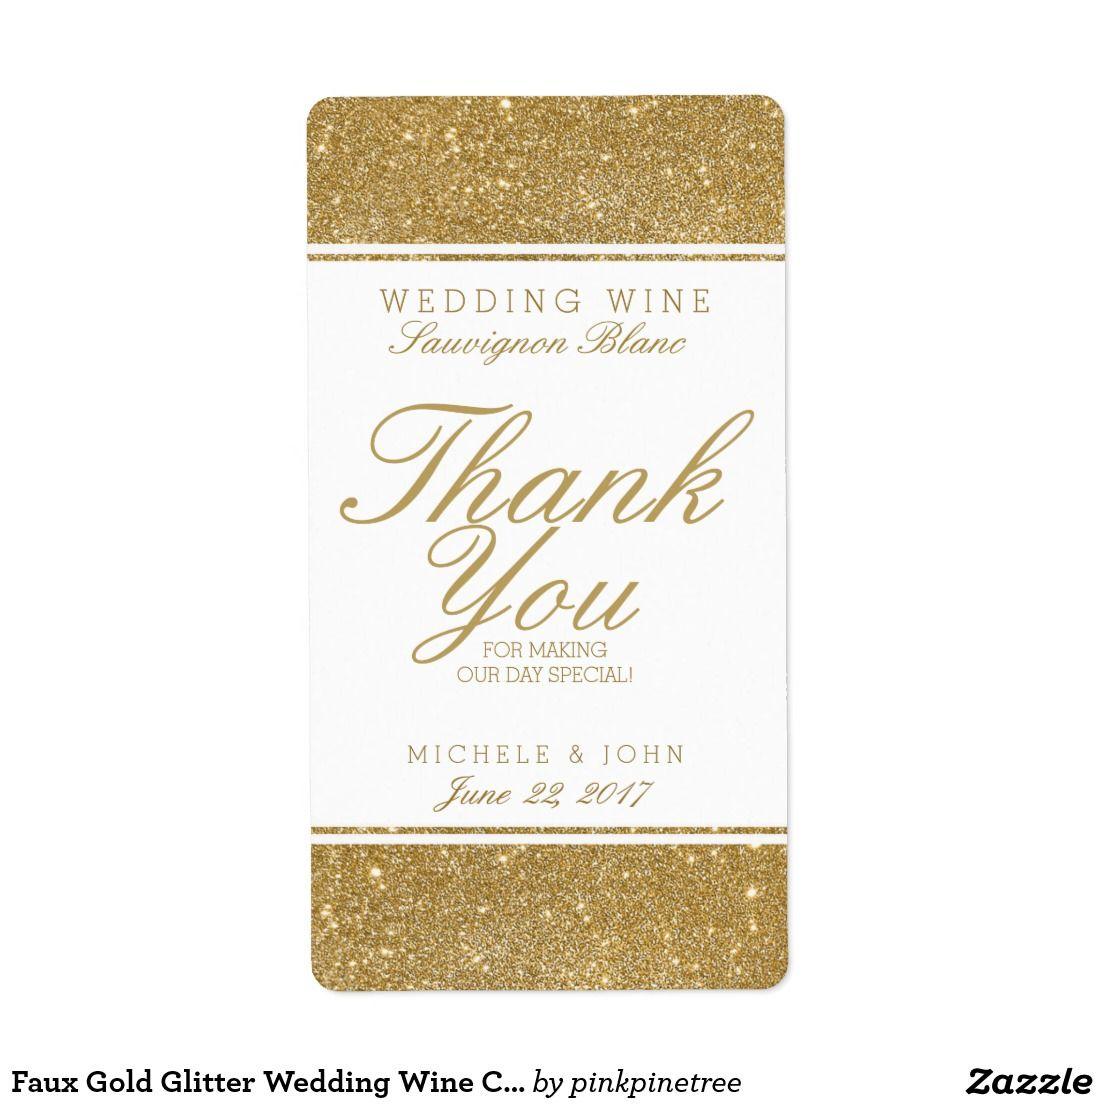 Faux Gold Glitter Wedding Wine Custom Label   Wedding labels ...